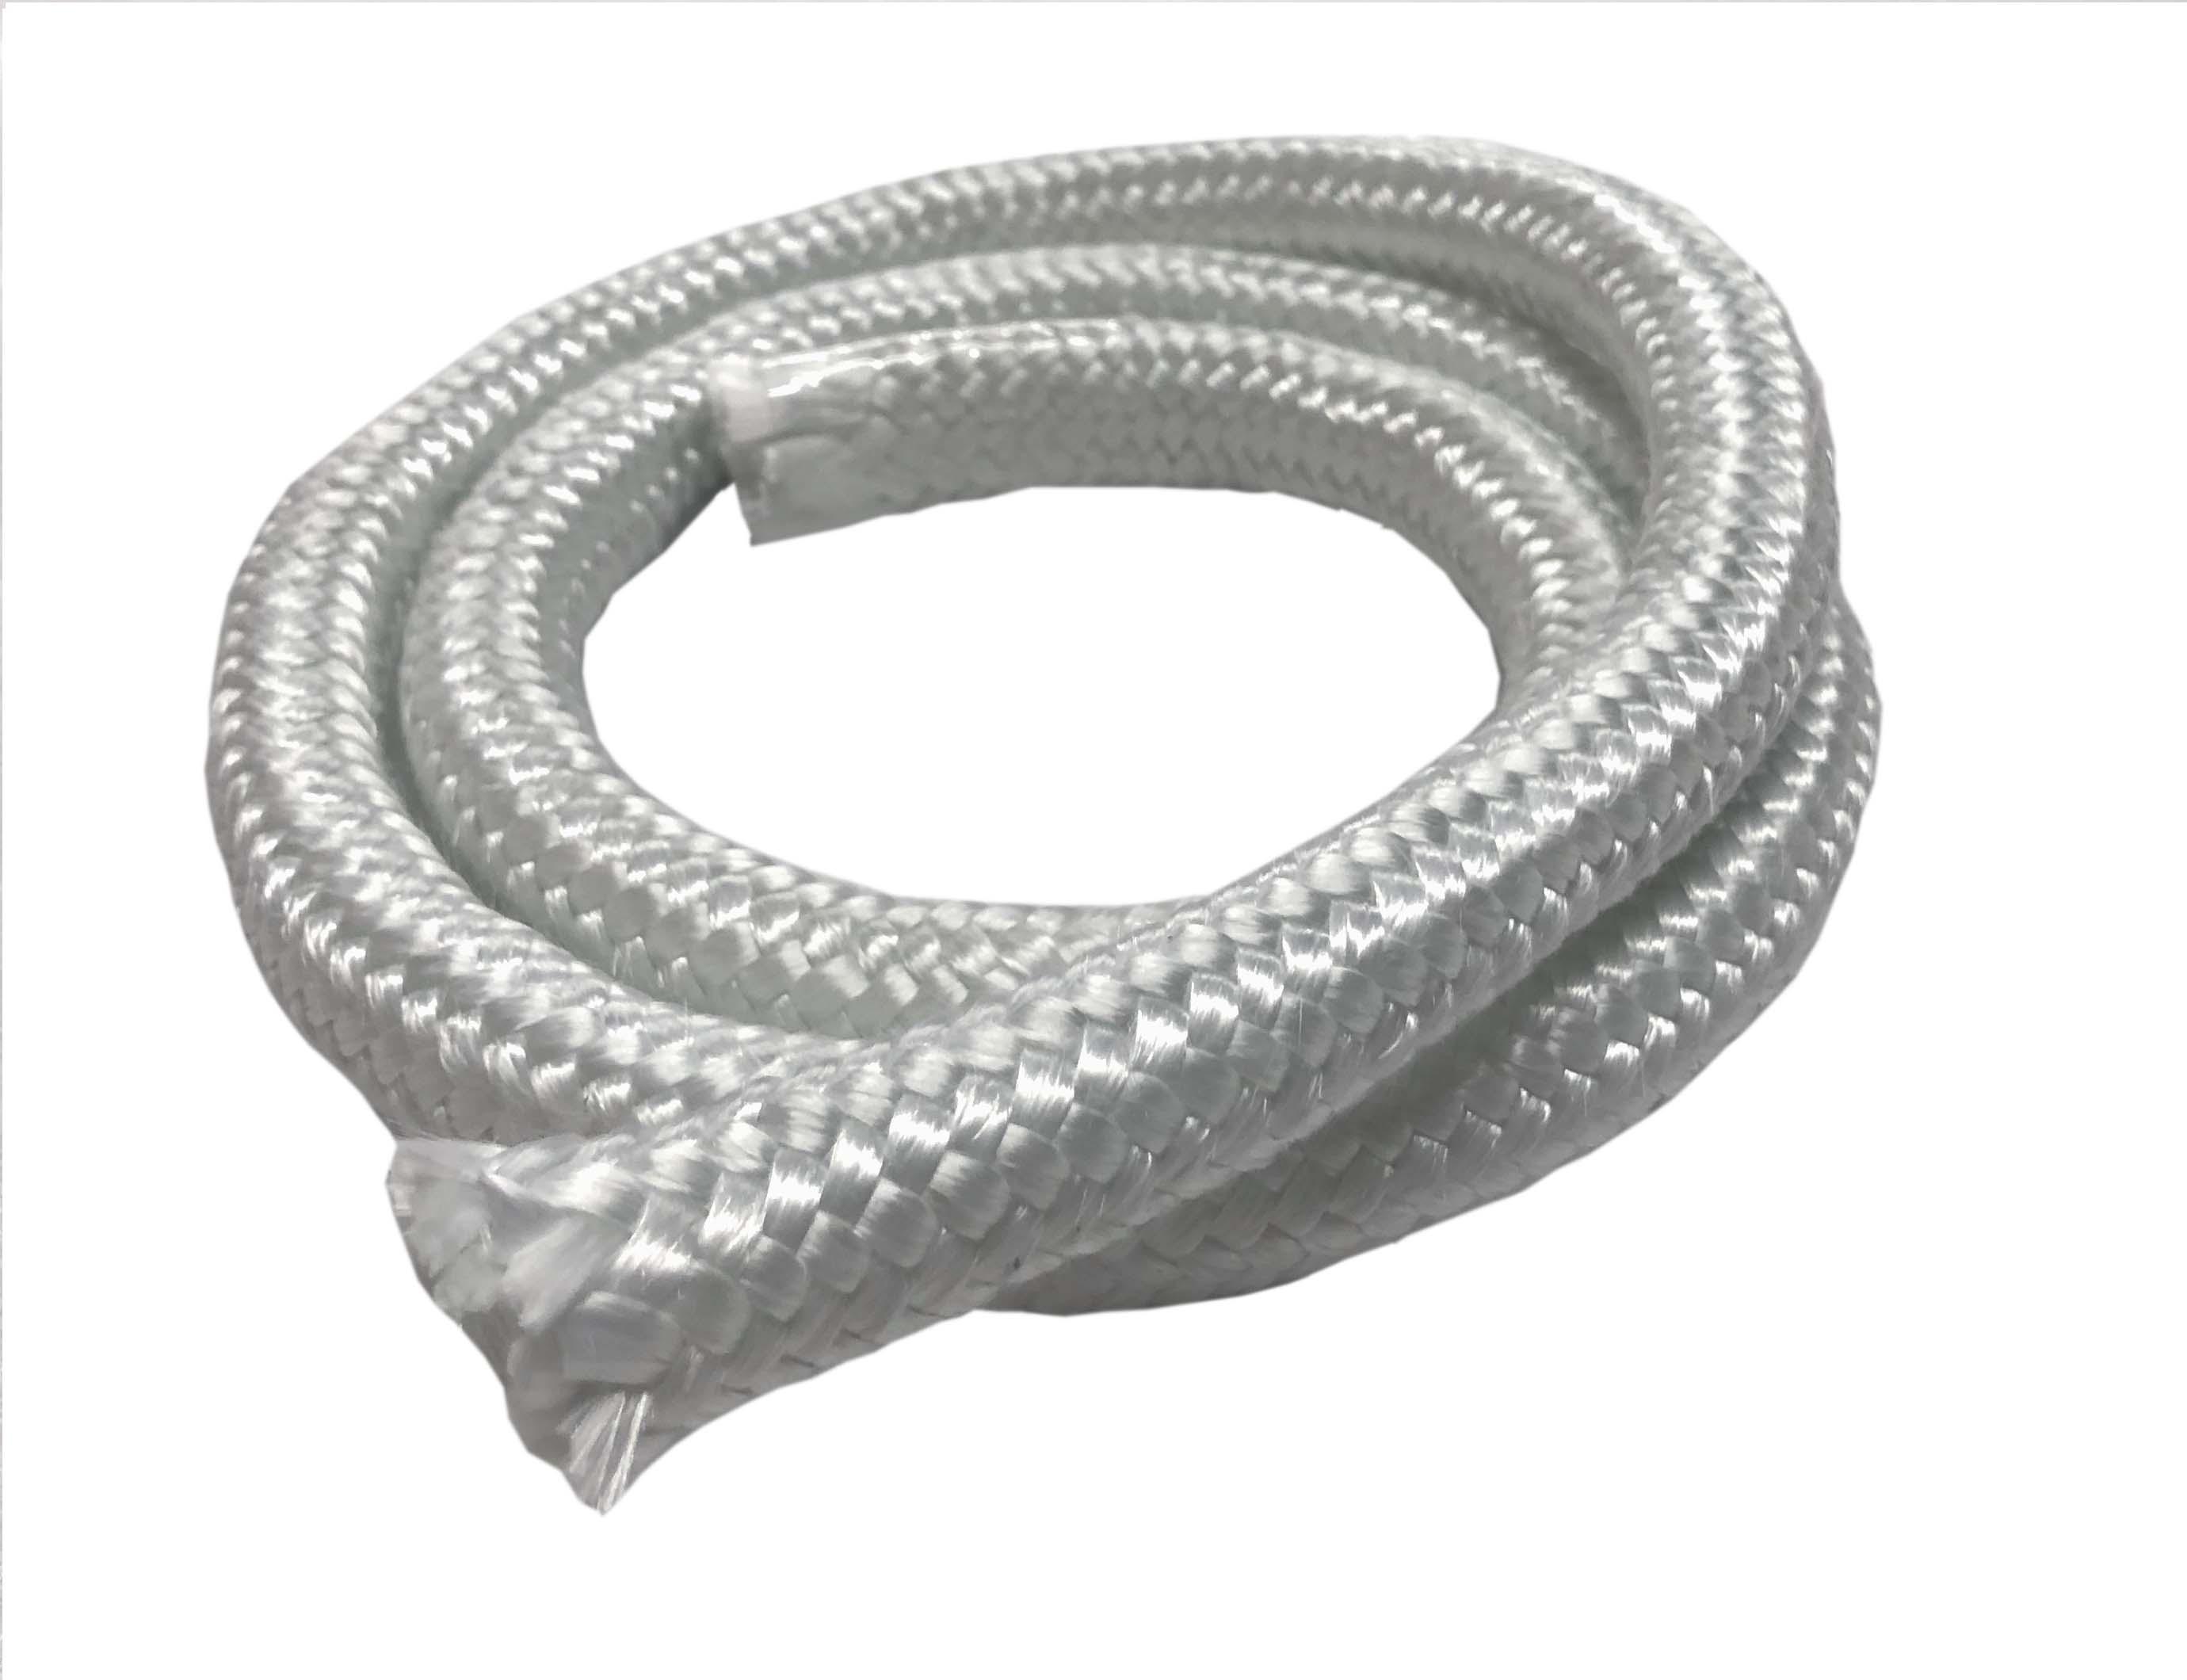 fiber glass braded rope